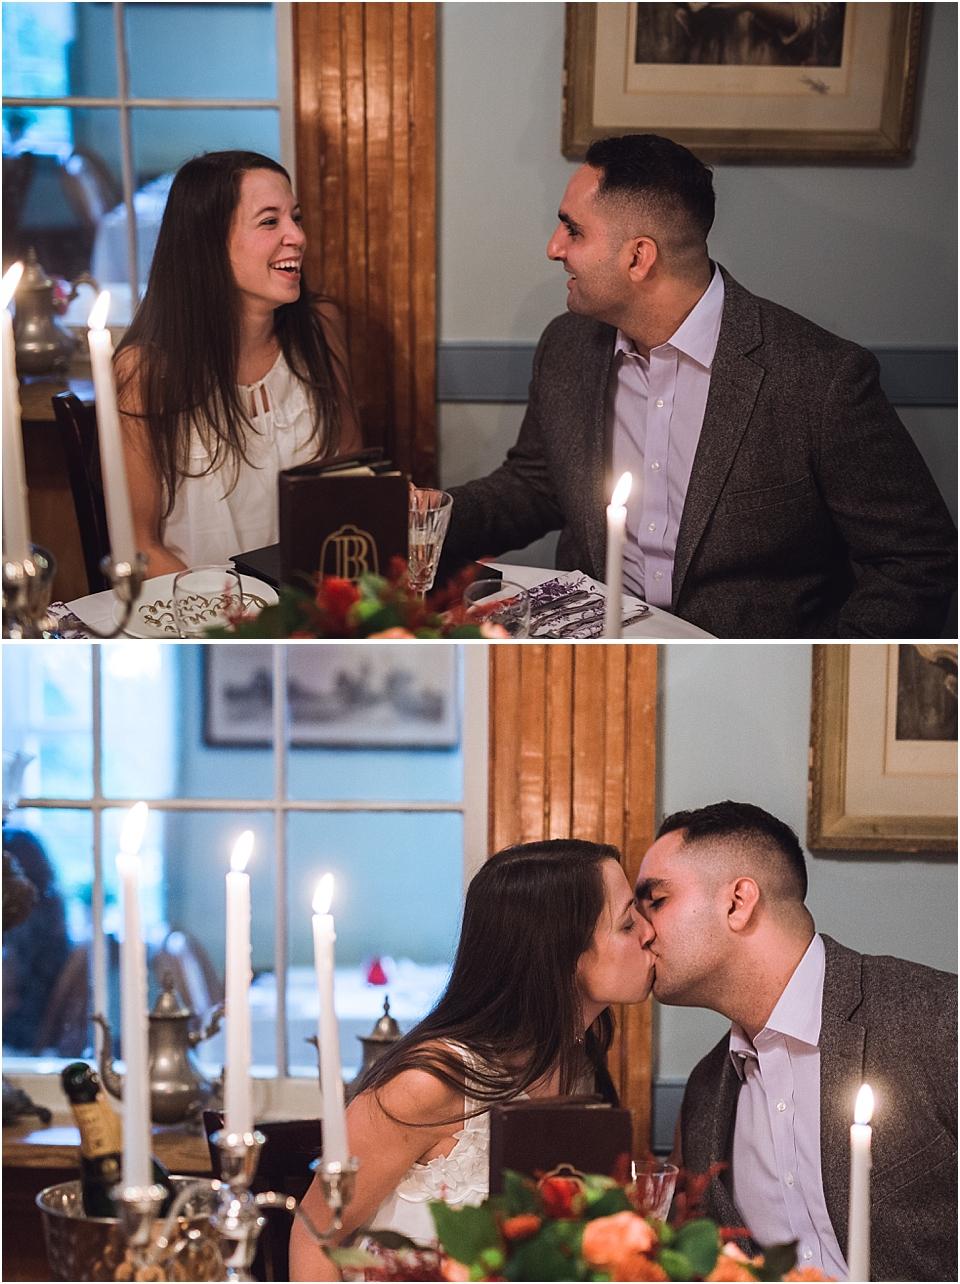 Erik & Jessica - Marriage Proposal - Kamp Weddings_0013.jpg